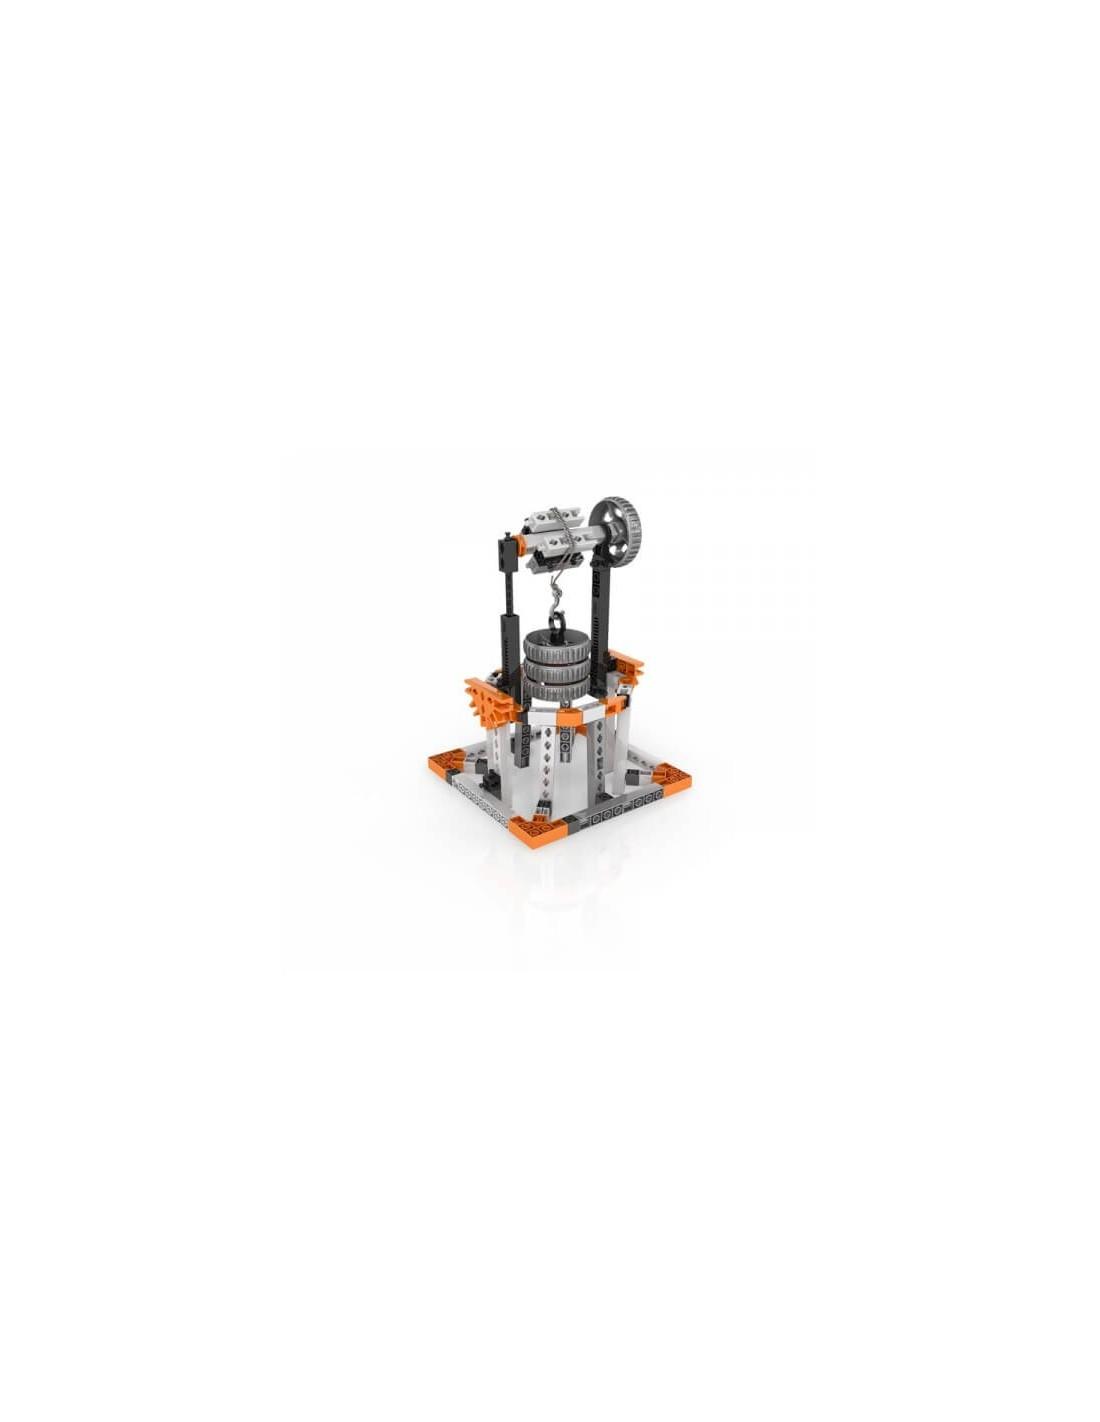 Set de constructie - STEM Wheels, Axles and Inclined Planes | Engino - 2